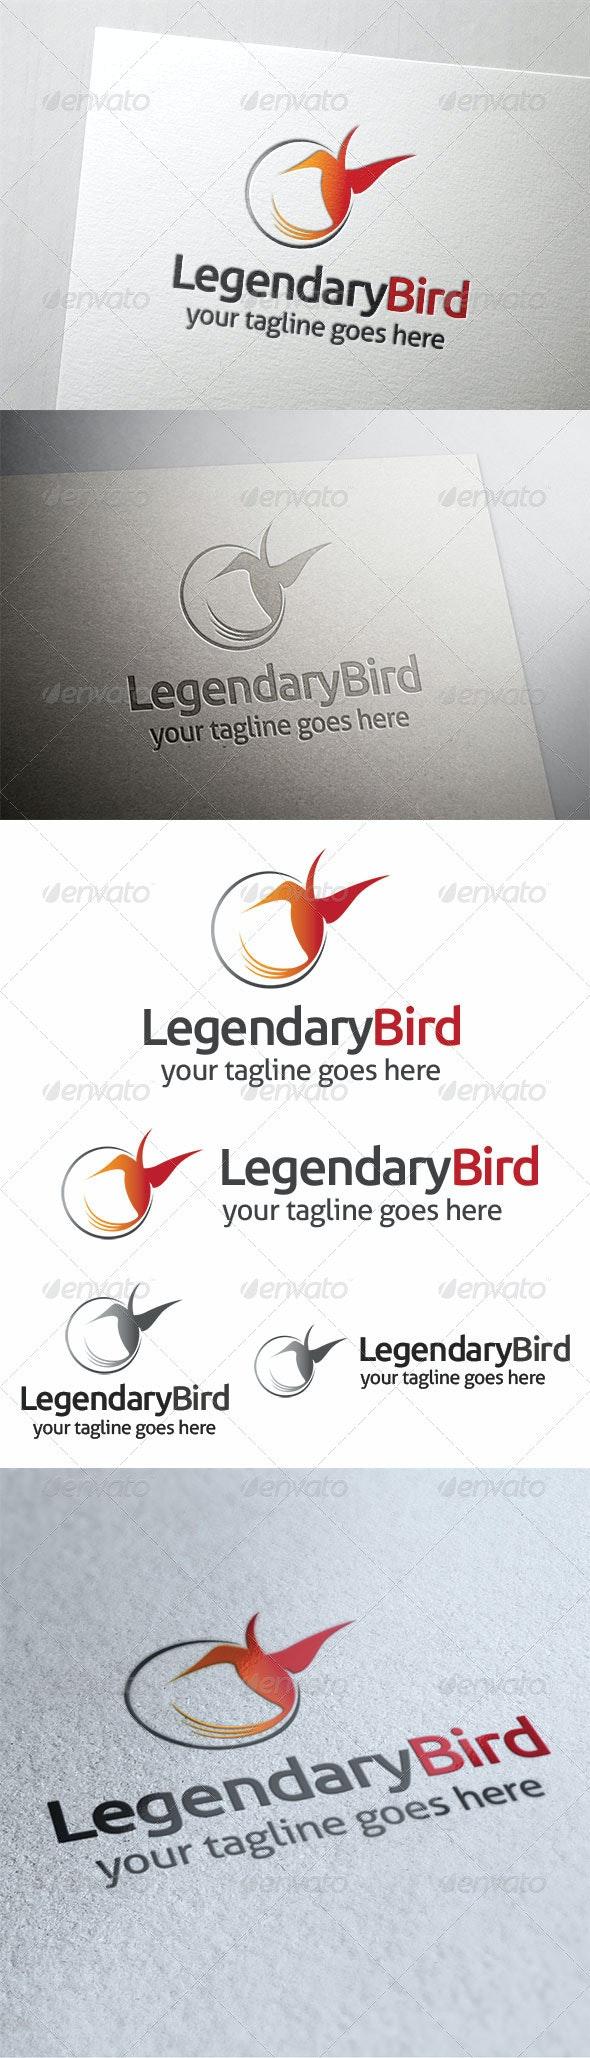 Legendary Bird - Symbols Logo Templates